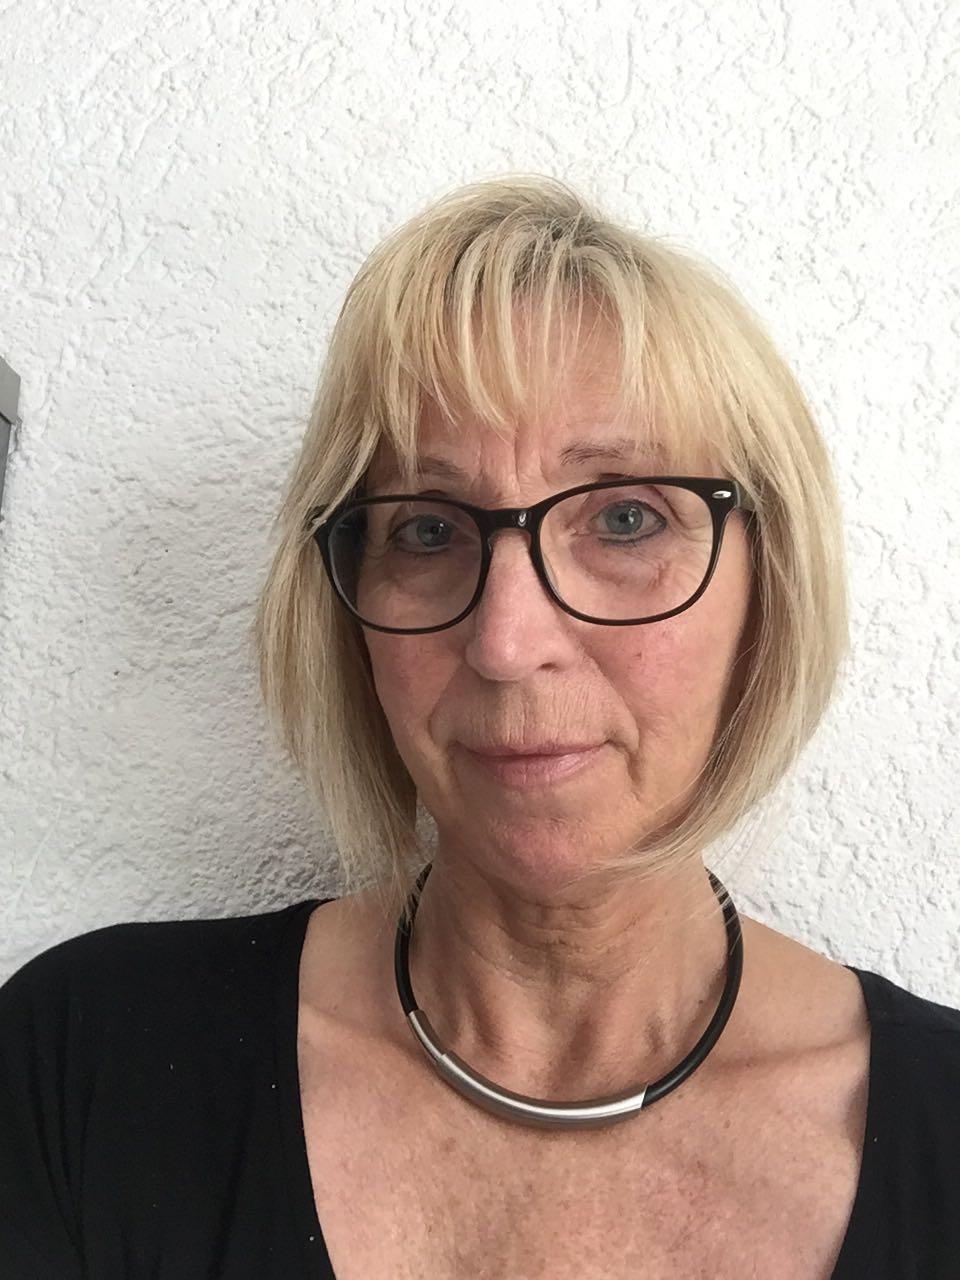 Rita Noss, Protokollarin, protokollarin@funkenrotweiss-nwd.de